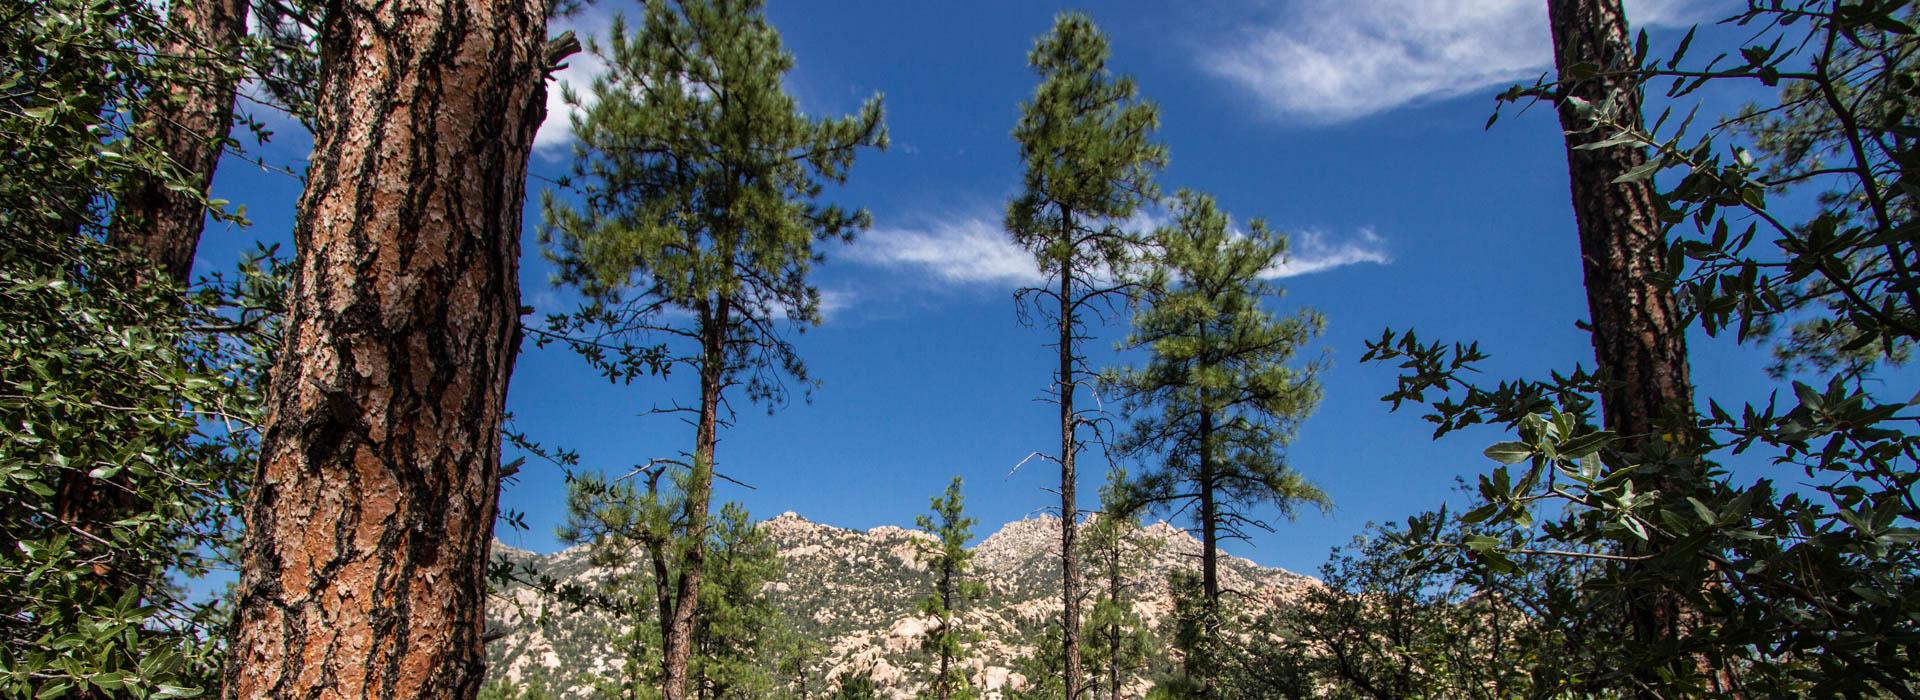 Granite Mountain at Granite Basin USFS Prescott Arizona Photographer Rich Charpentier